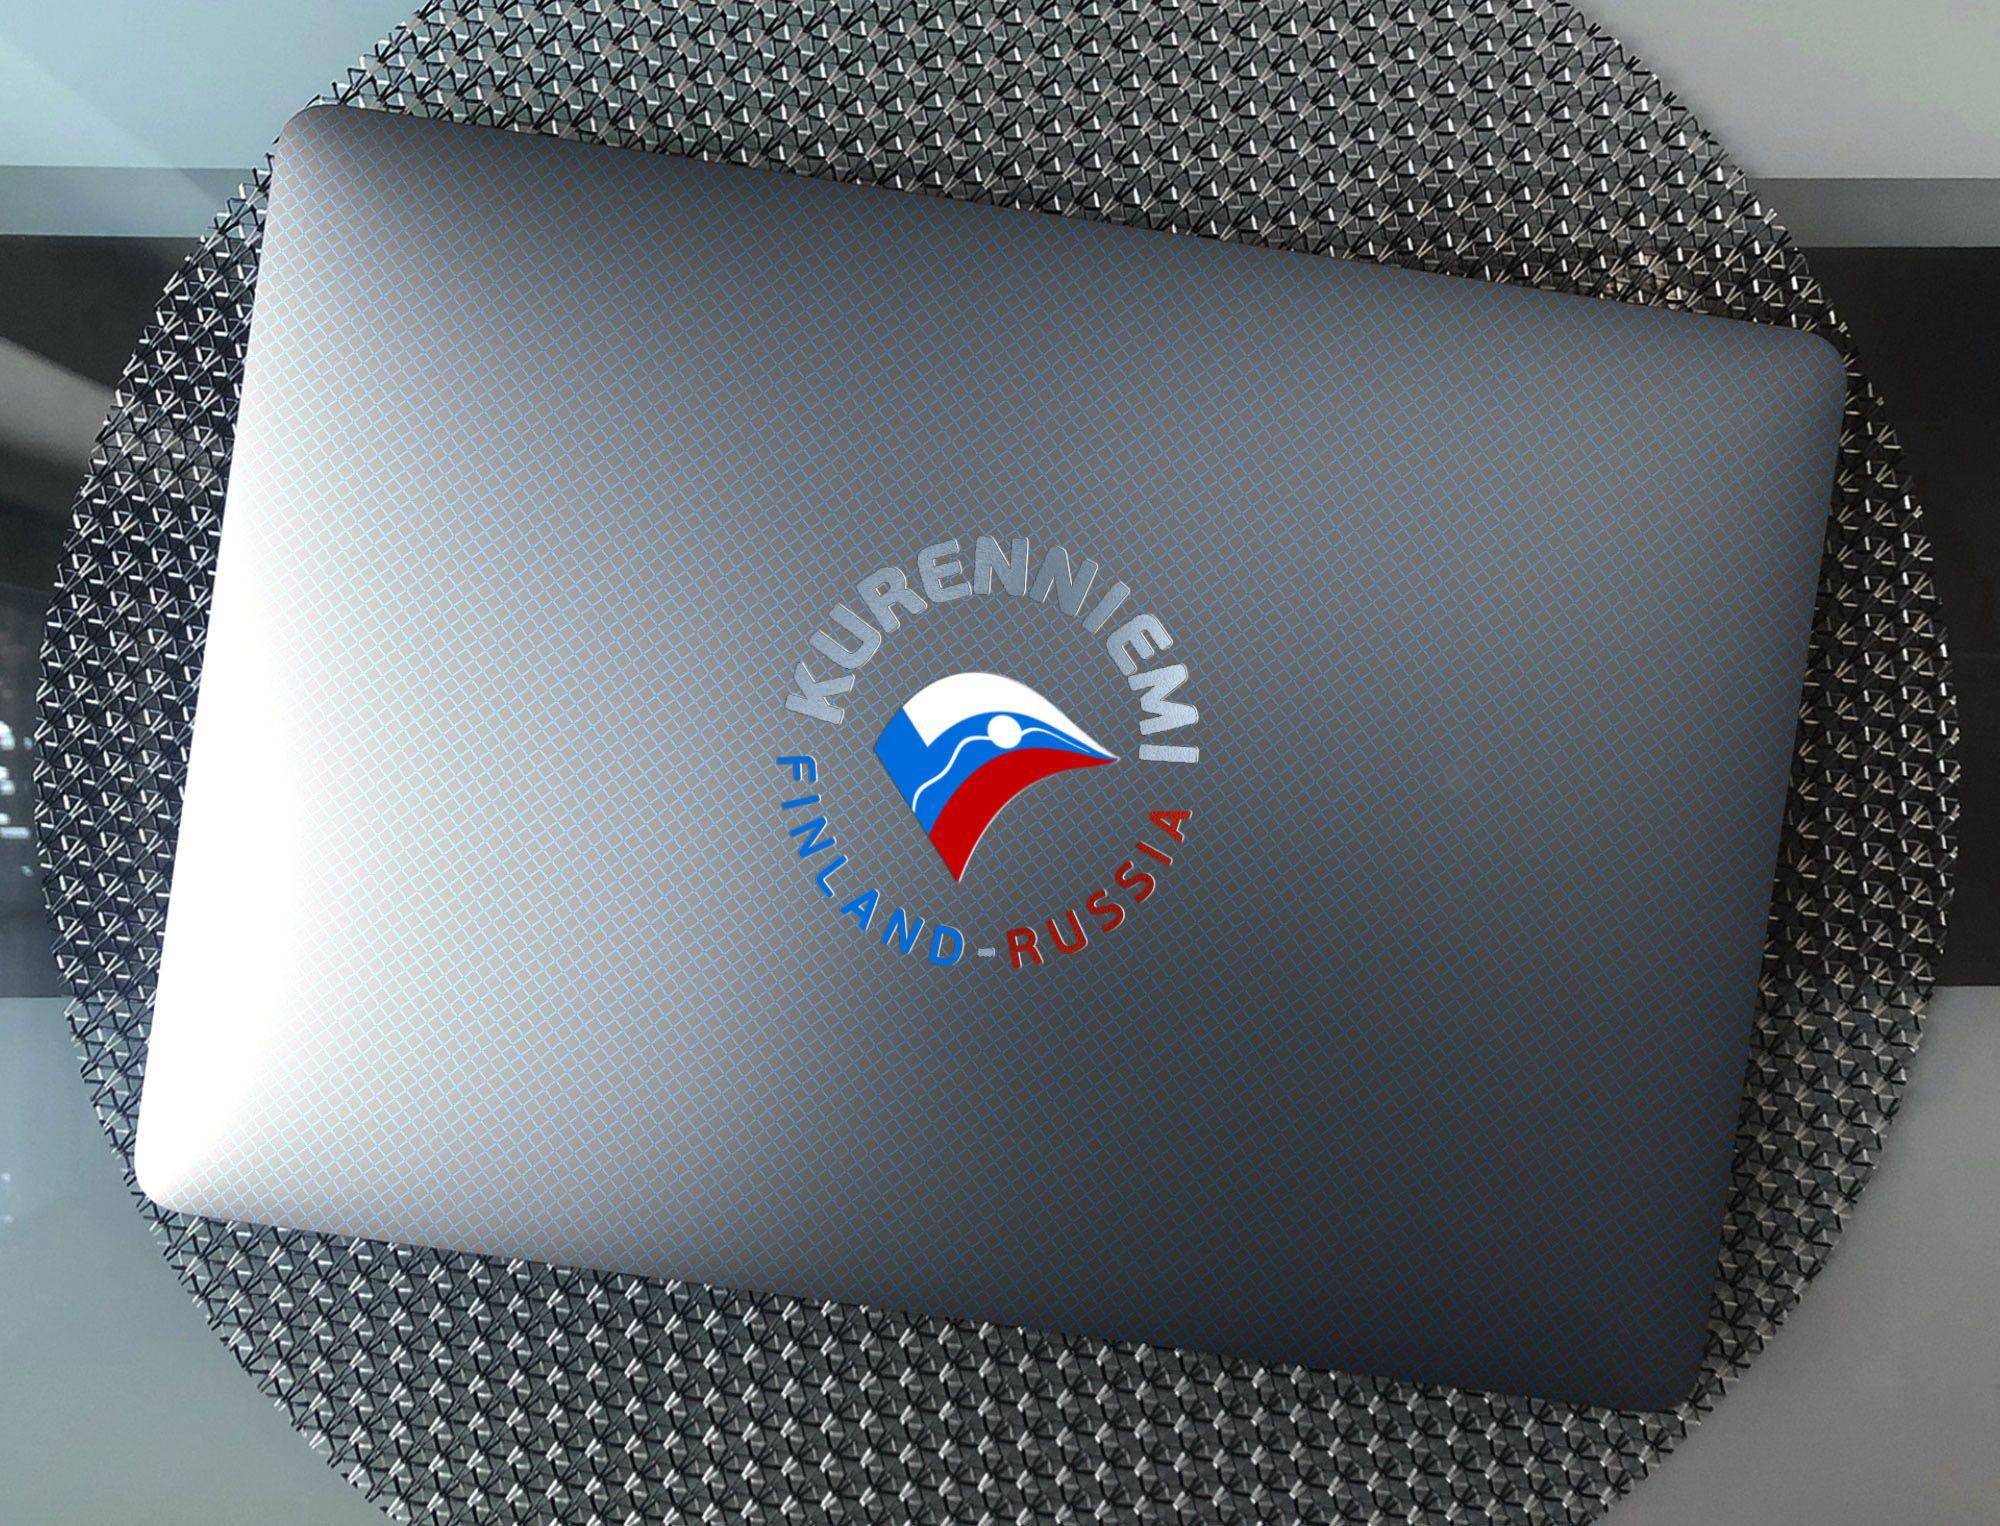 Логотип для Kurenniemi, FinAgRu-nat, Finland-Russia - дизайнер Architect